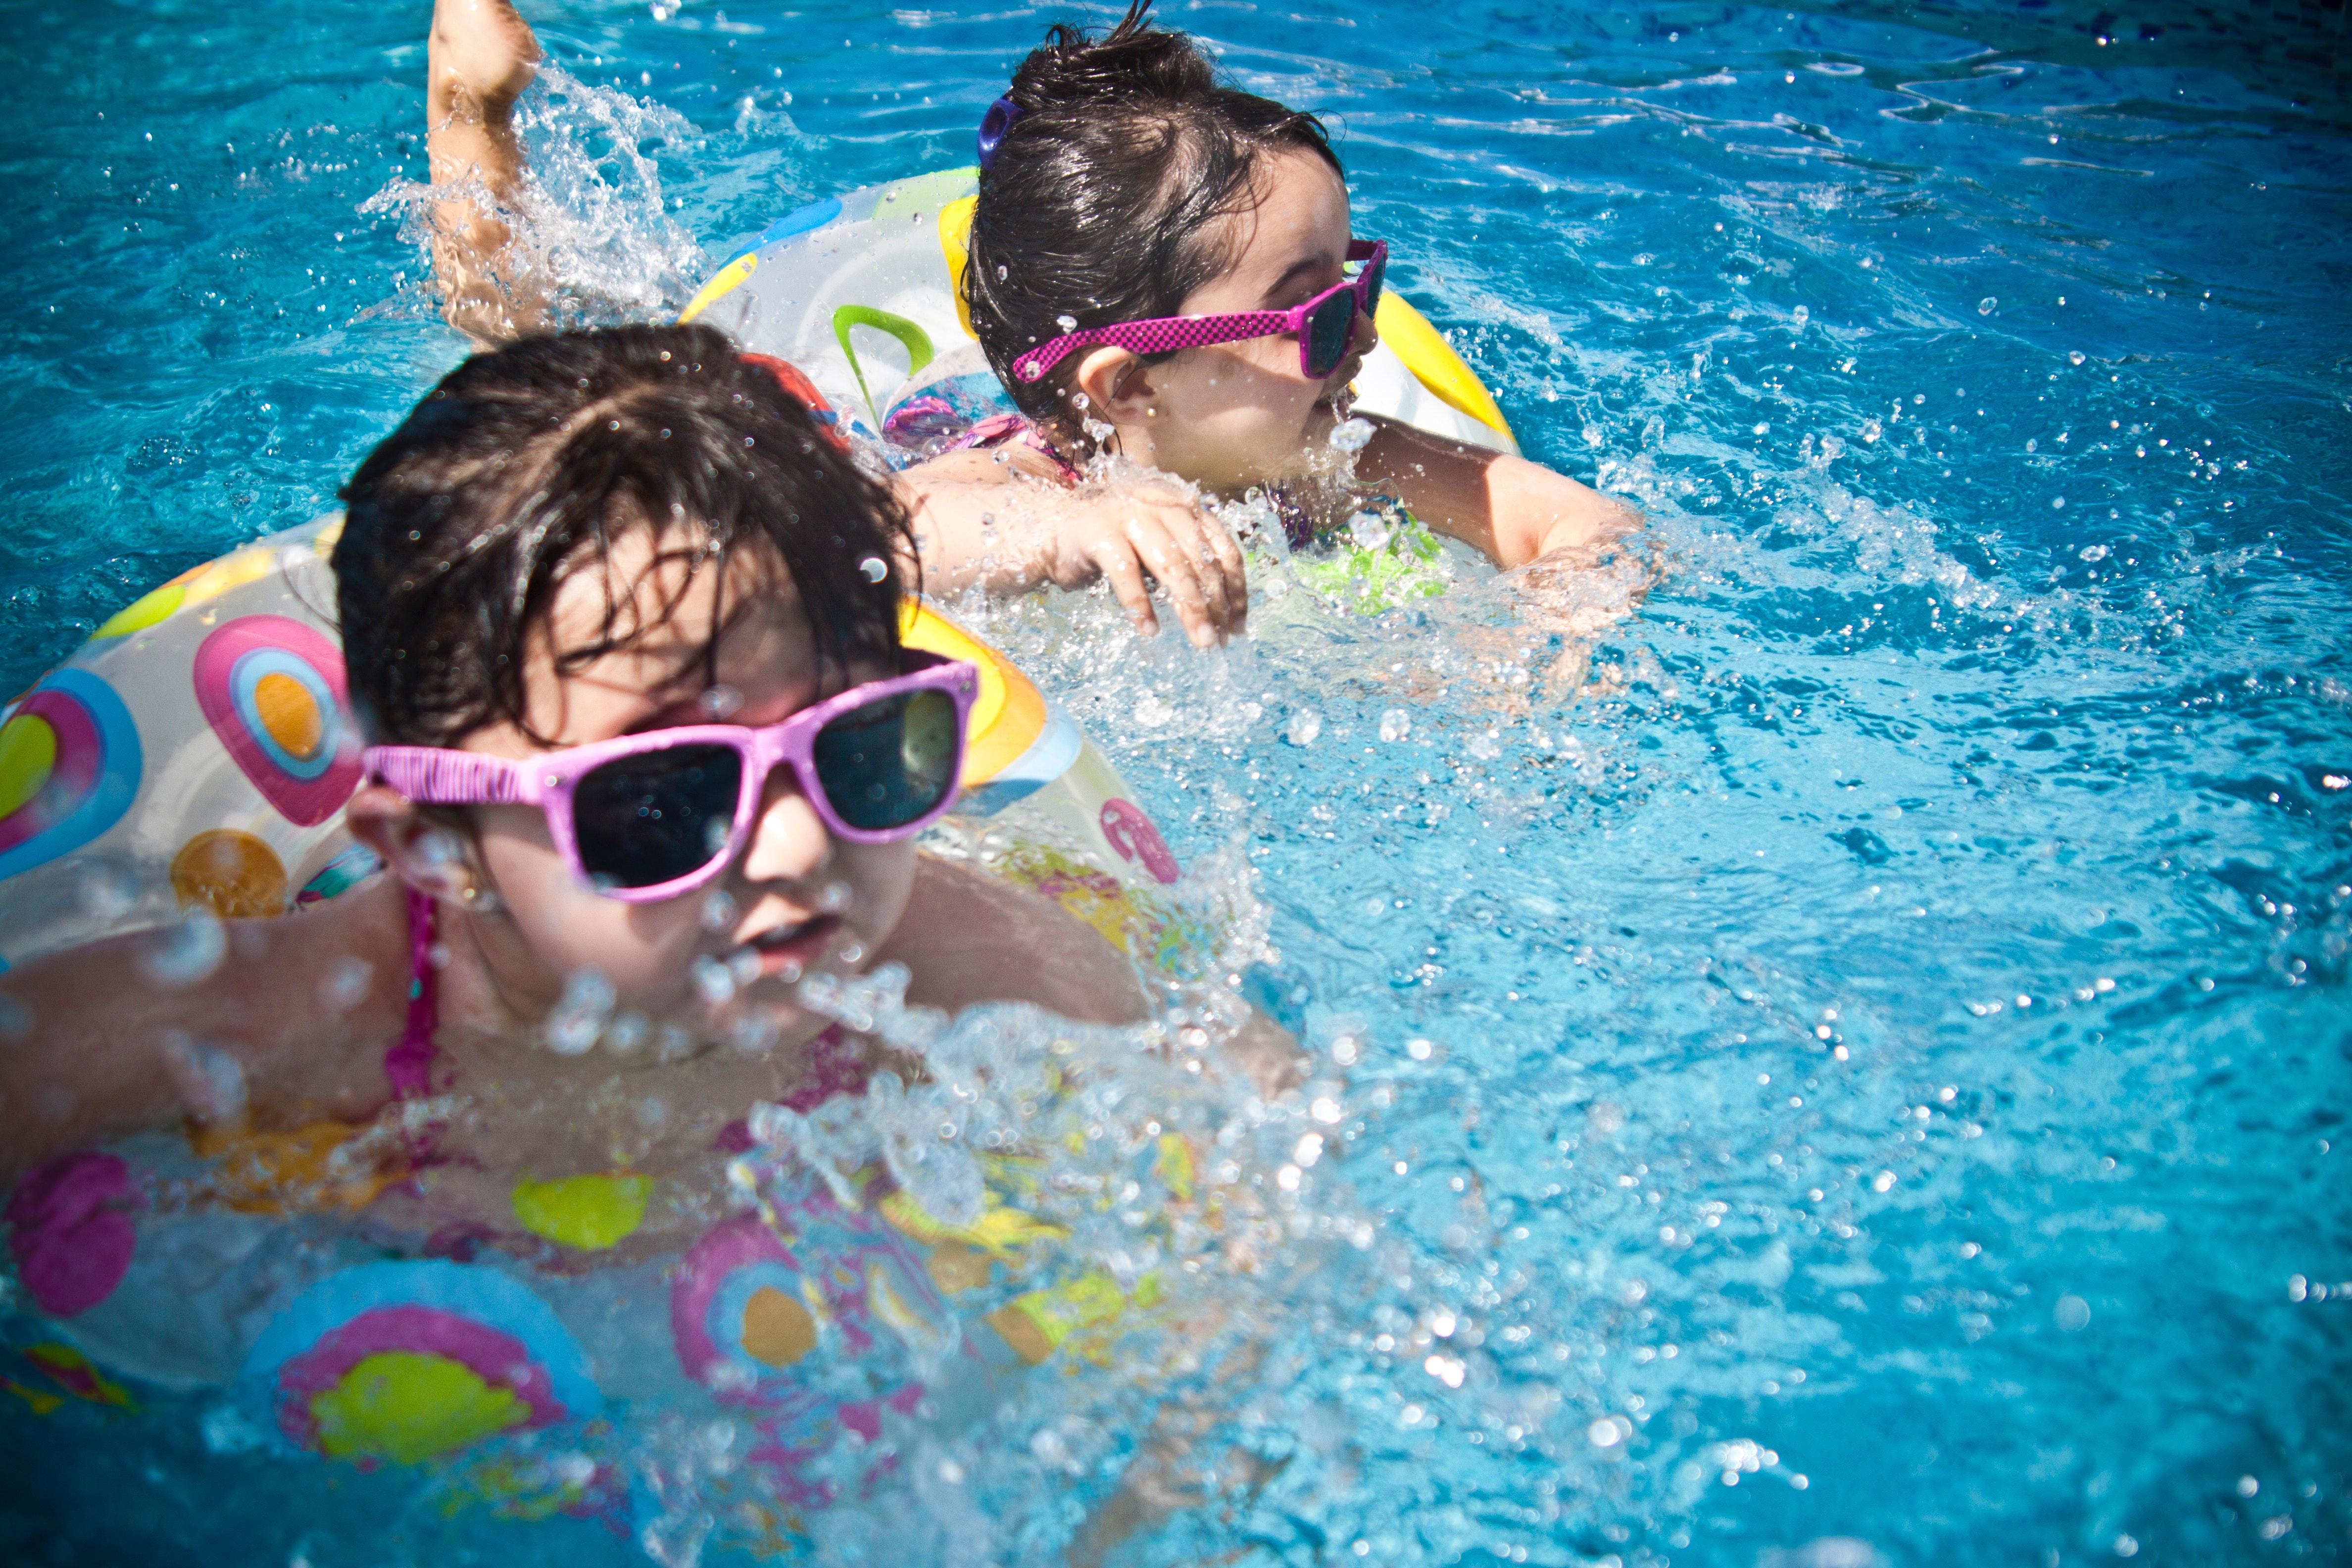 2 girl's swimming during daytime photo